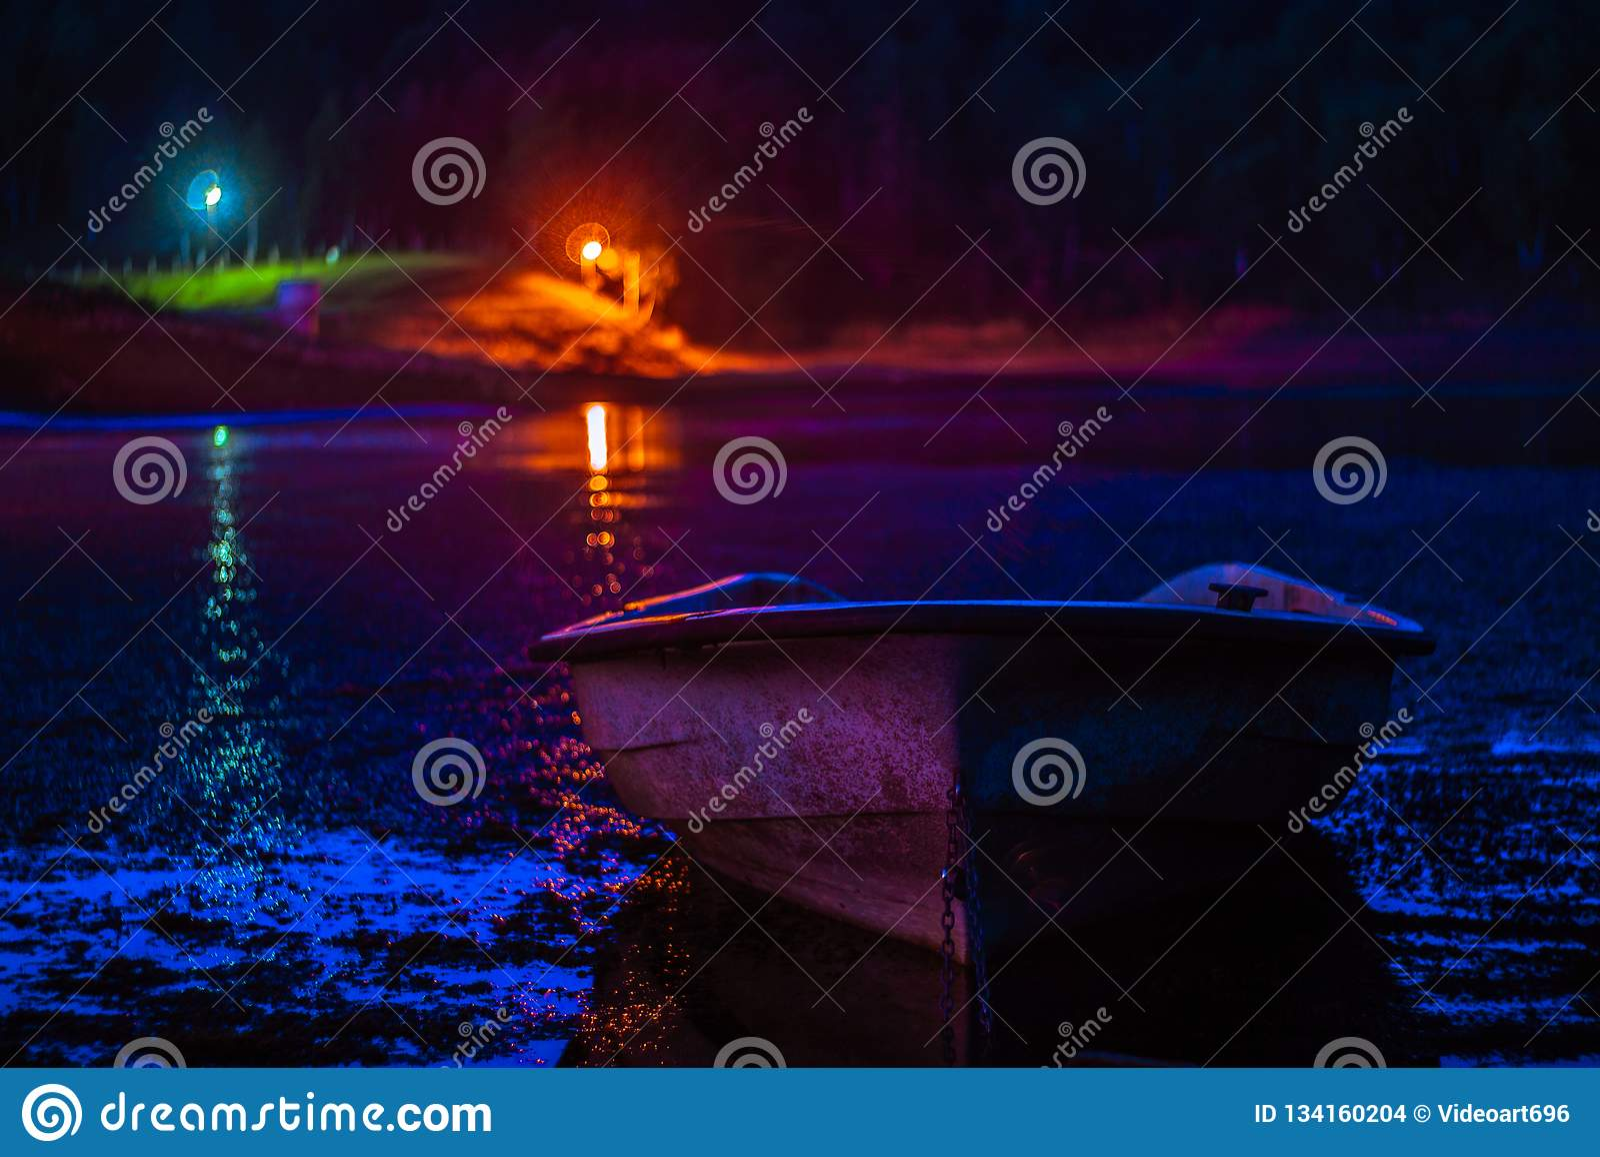 Barco iluminado por la luna